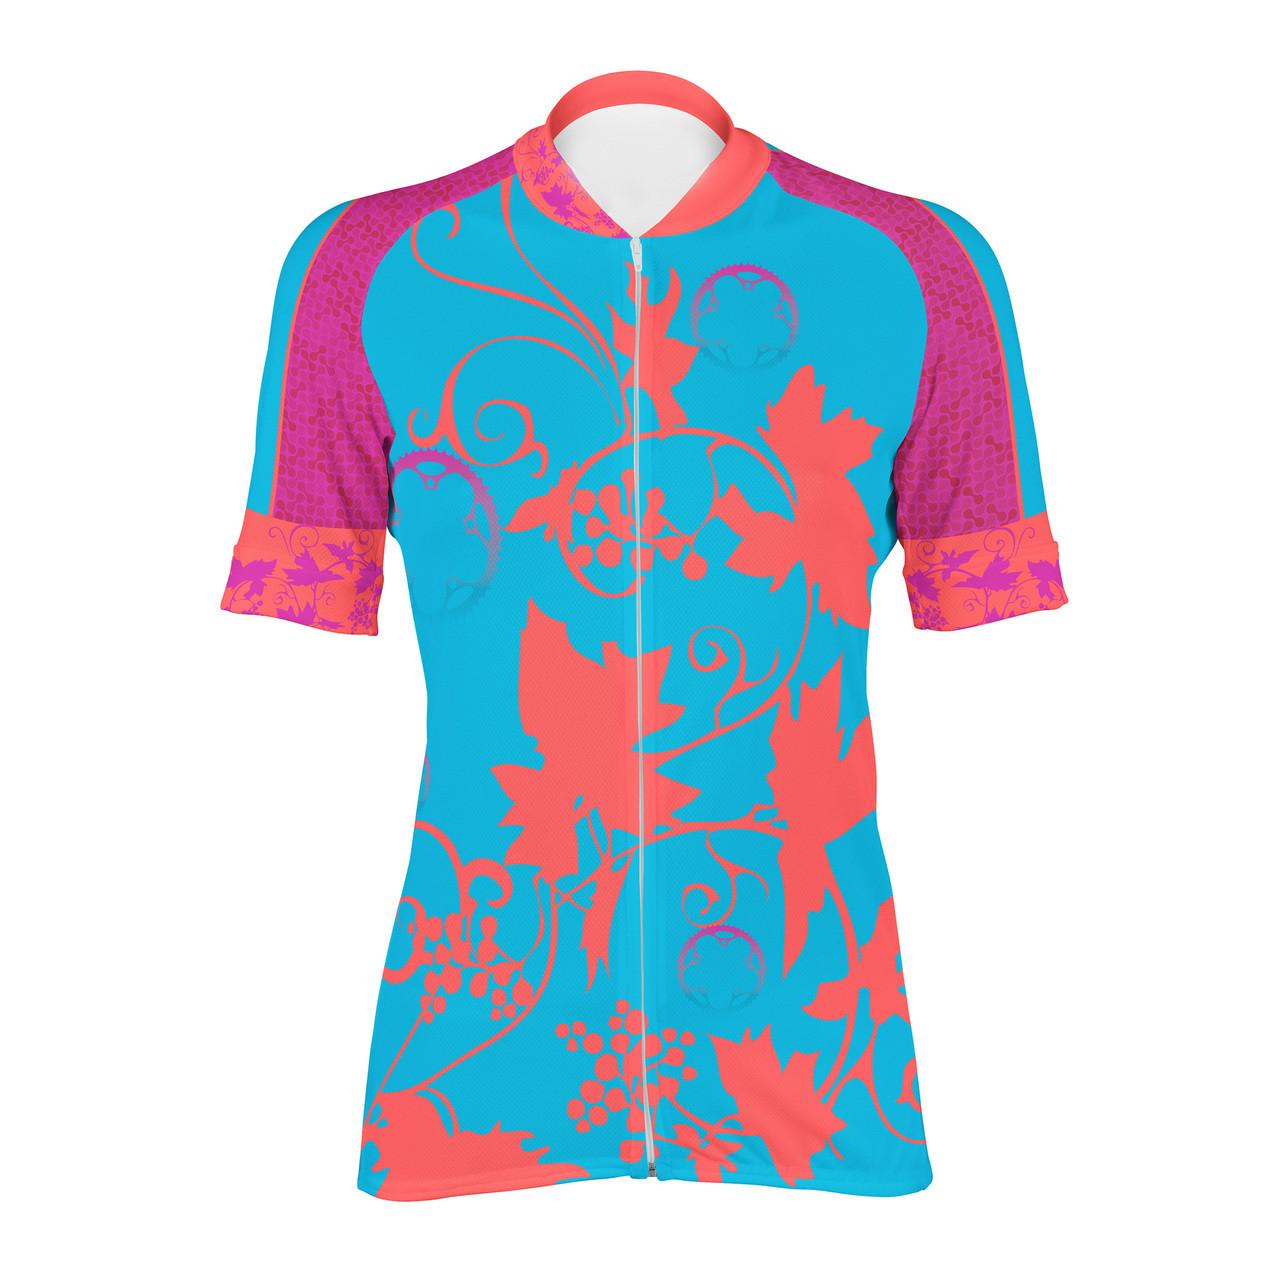 5a62e5a1c4350 Women s Cycling Jersey Vineyard Peak 1 Sports